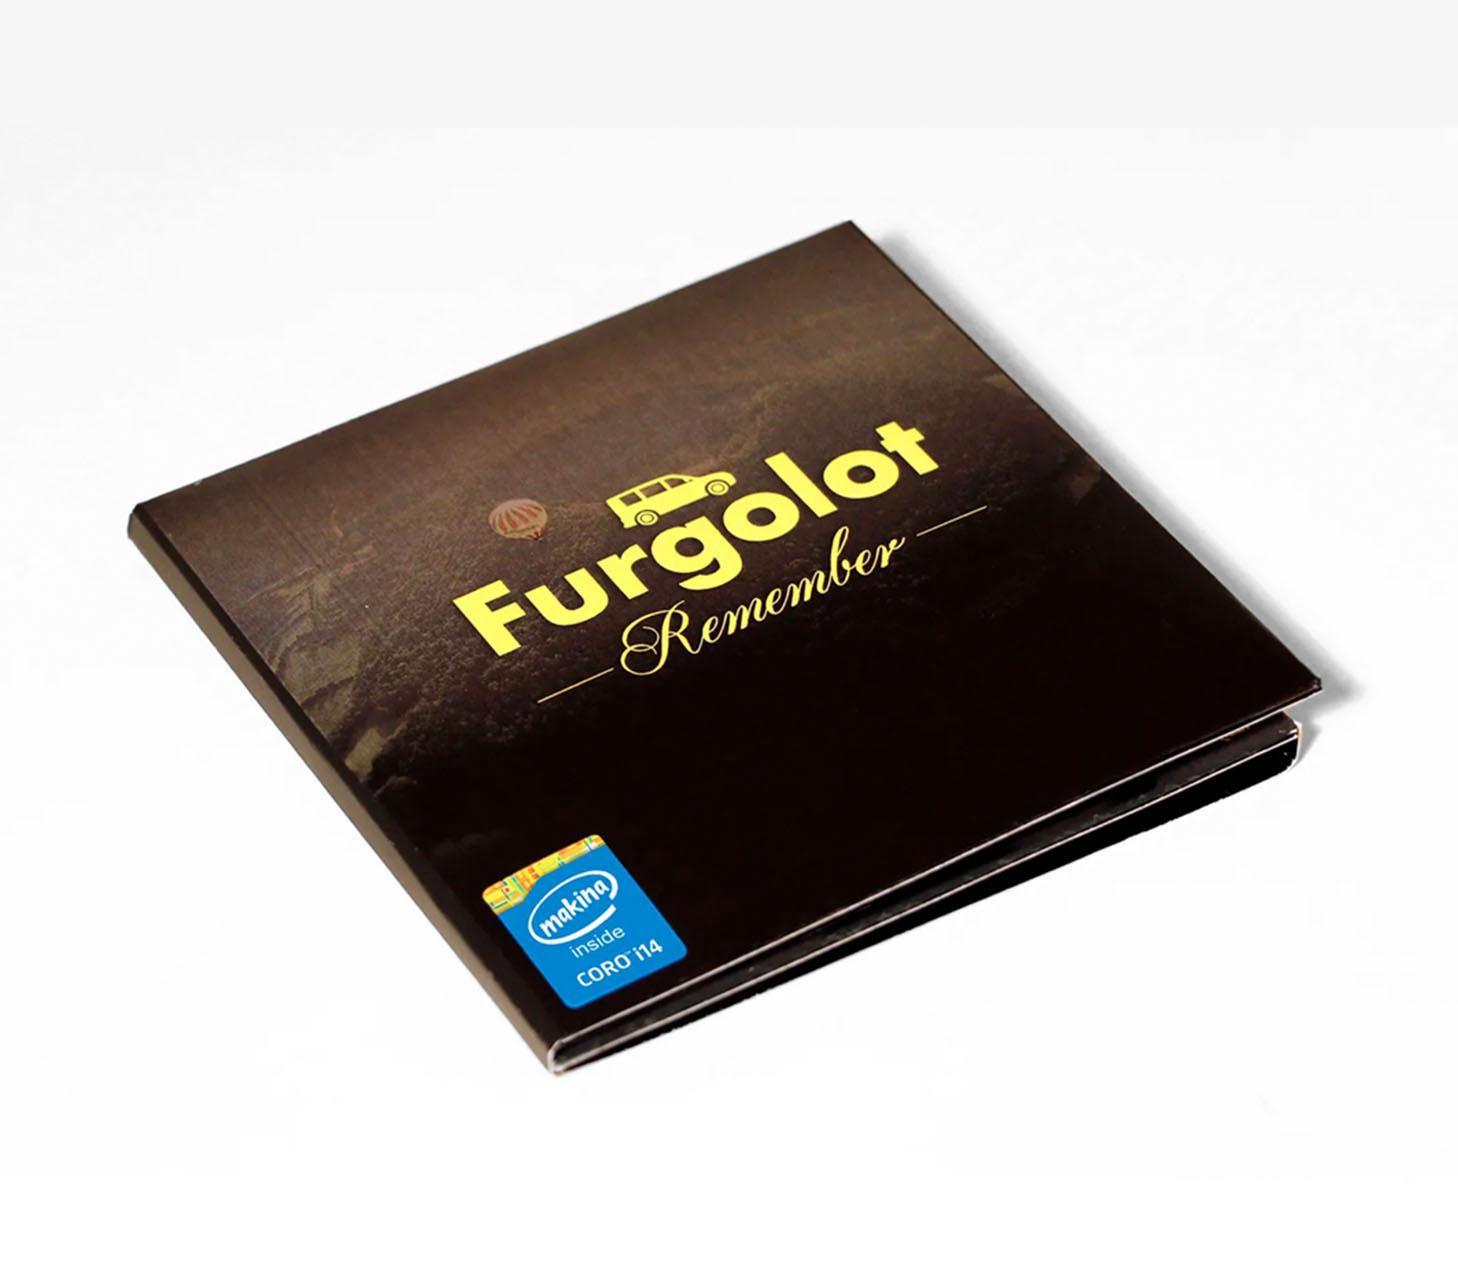 furgolot-album-portada